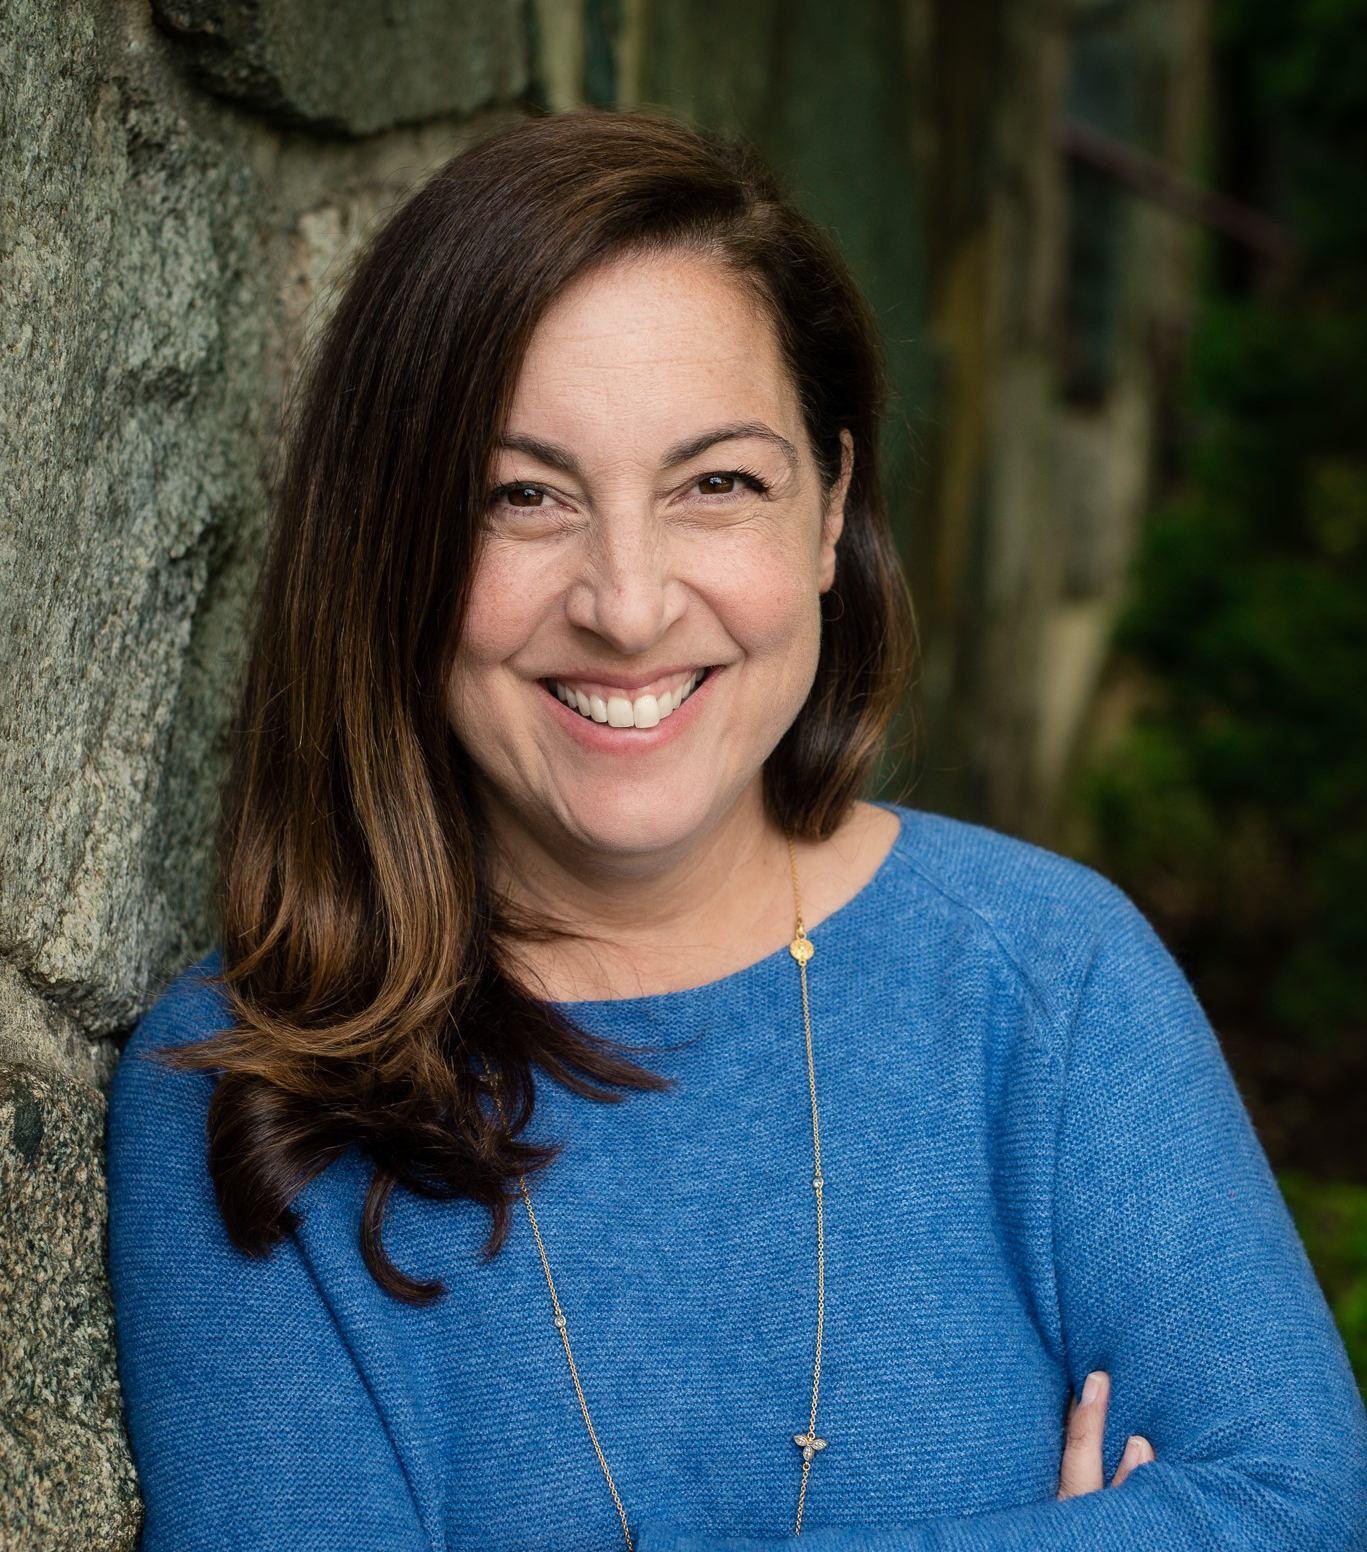 Jennifer Barsamian